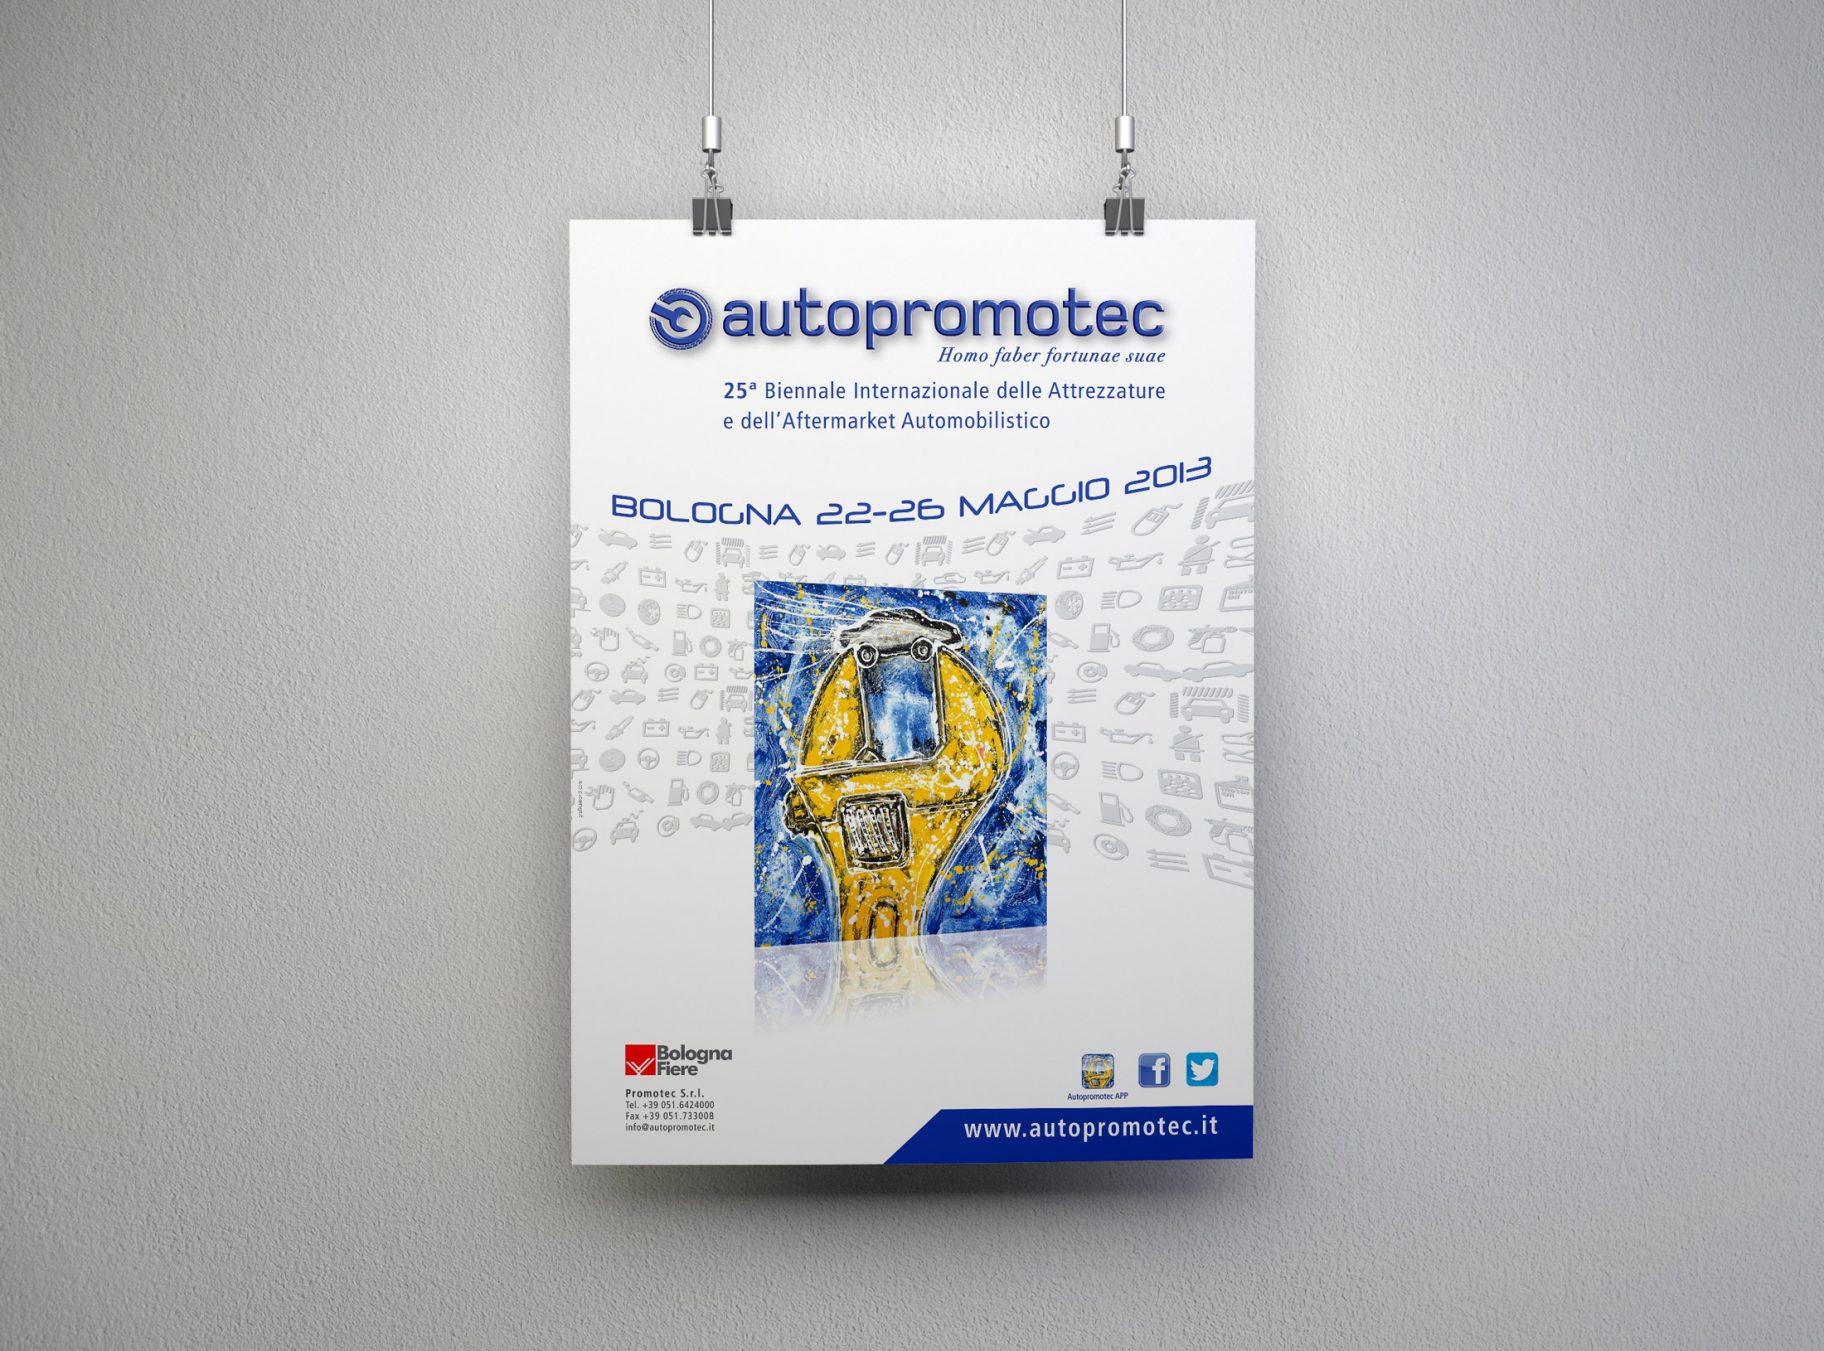 Autopromotec-fiera-2013-poster